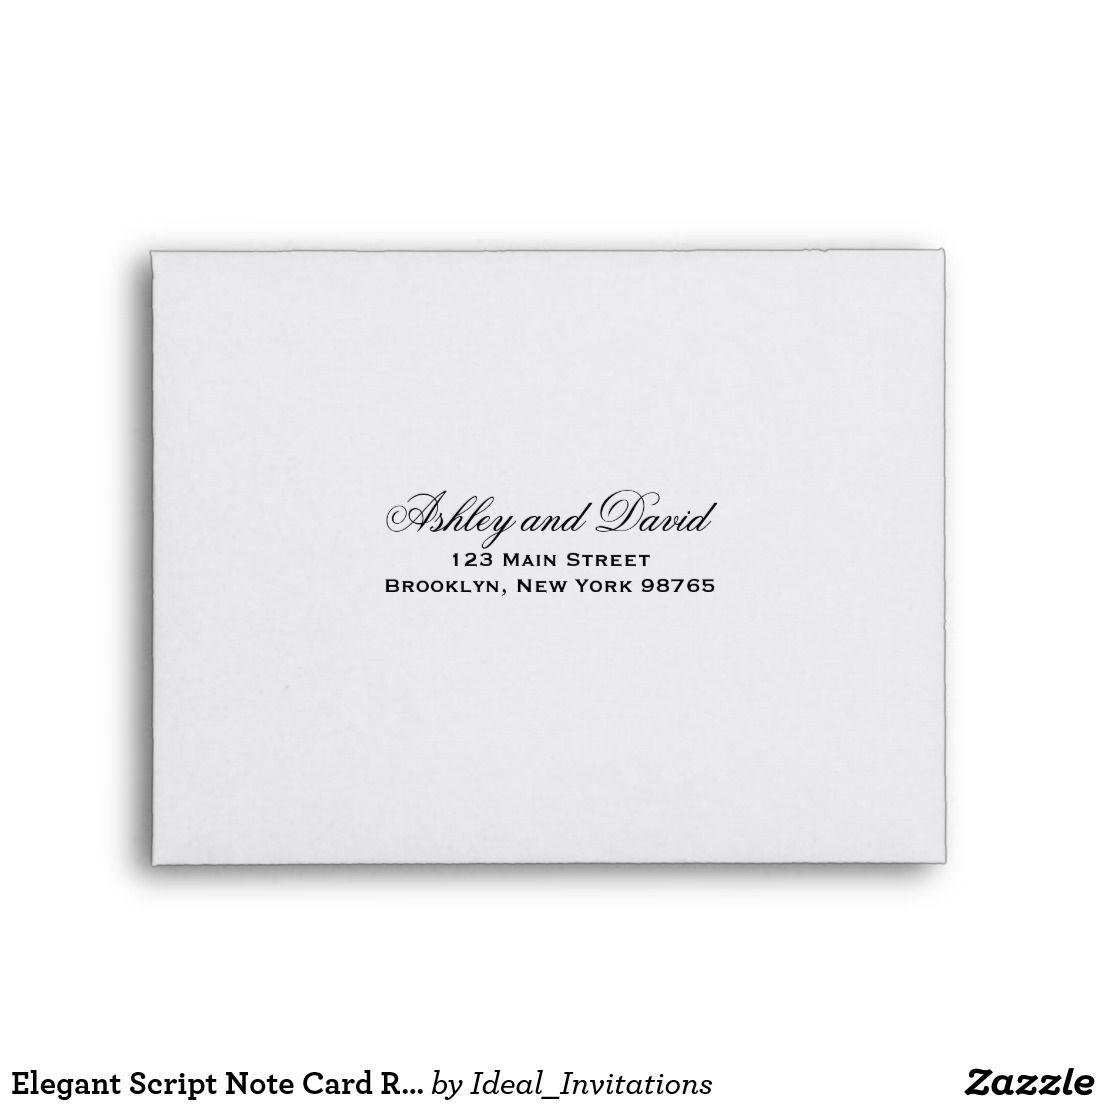 Elegant Script Note Card Return Address Envelope Zazzle Com Custom Printed Envelopes Note Cards Printed Envelopes